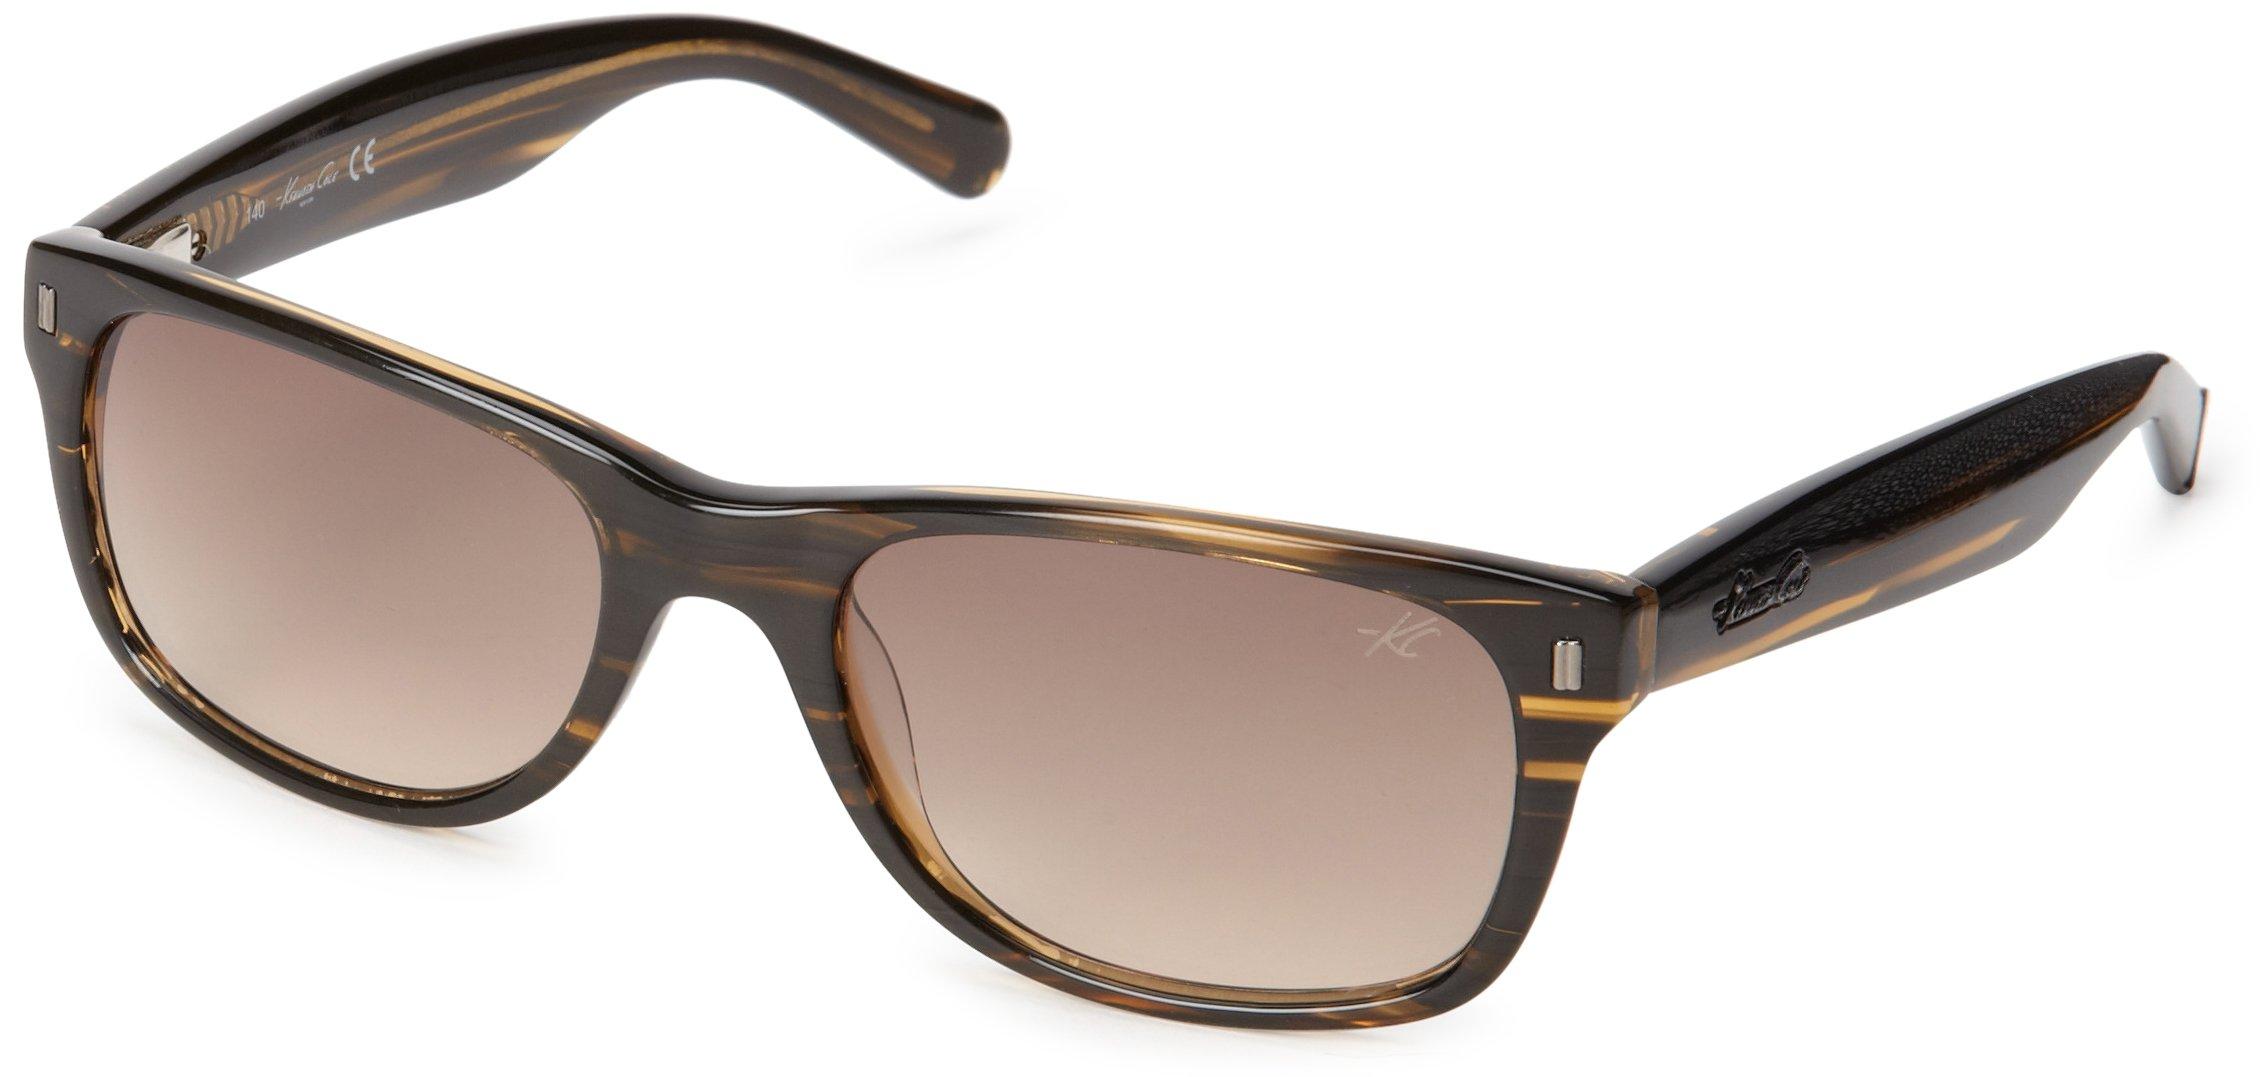 Kenneth Cole New York KC7123W5362F Wayfarer Sunglasses,Brown Horn,53 mm